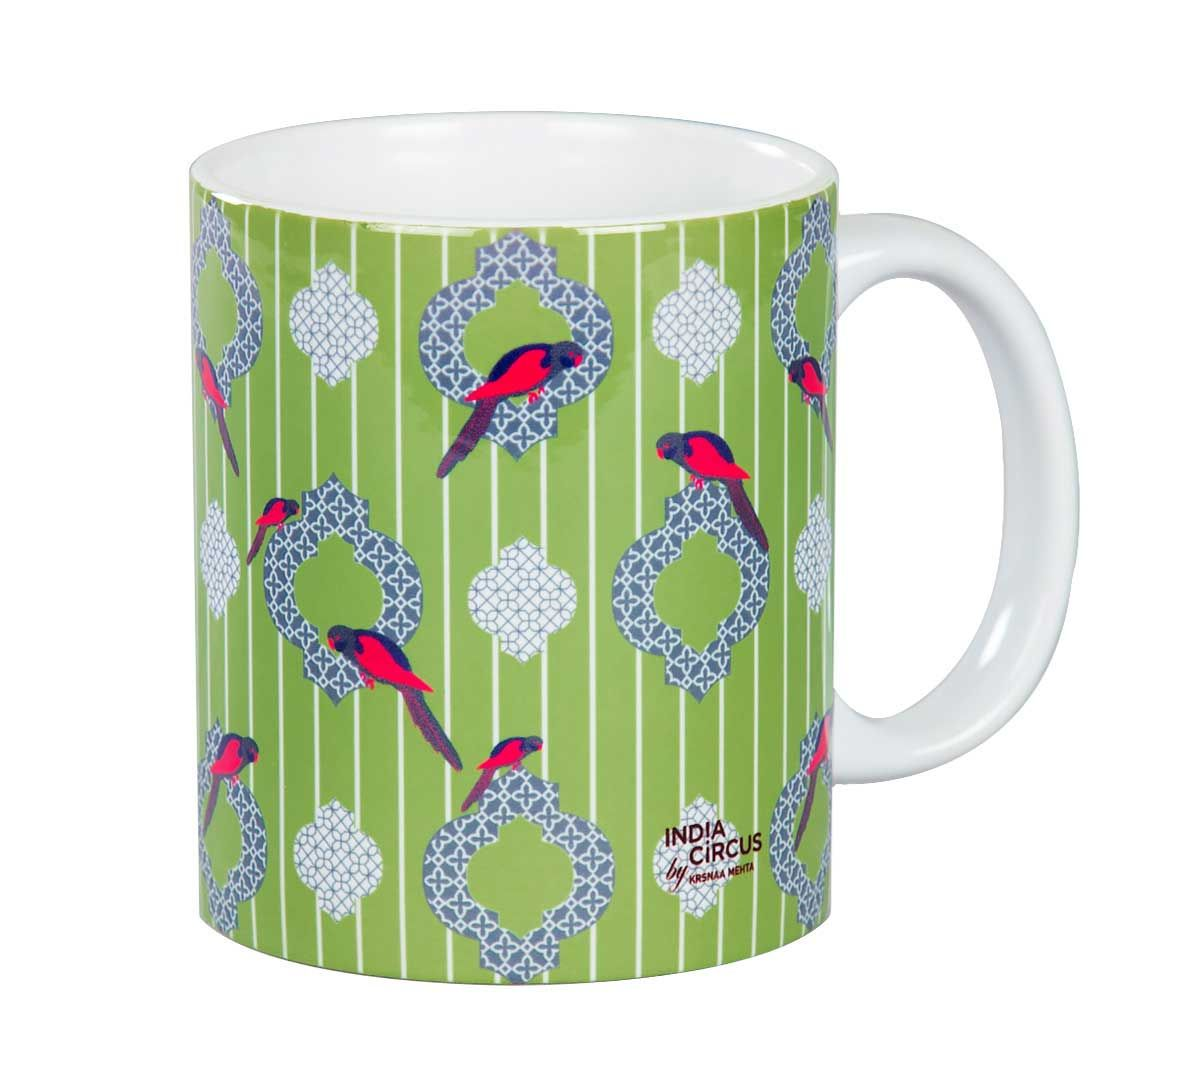 Peeking Parrots Mug